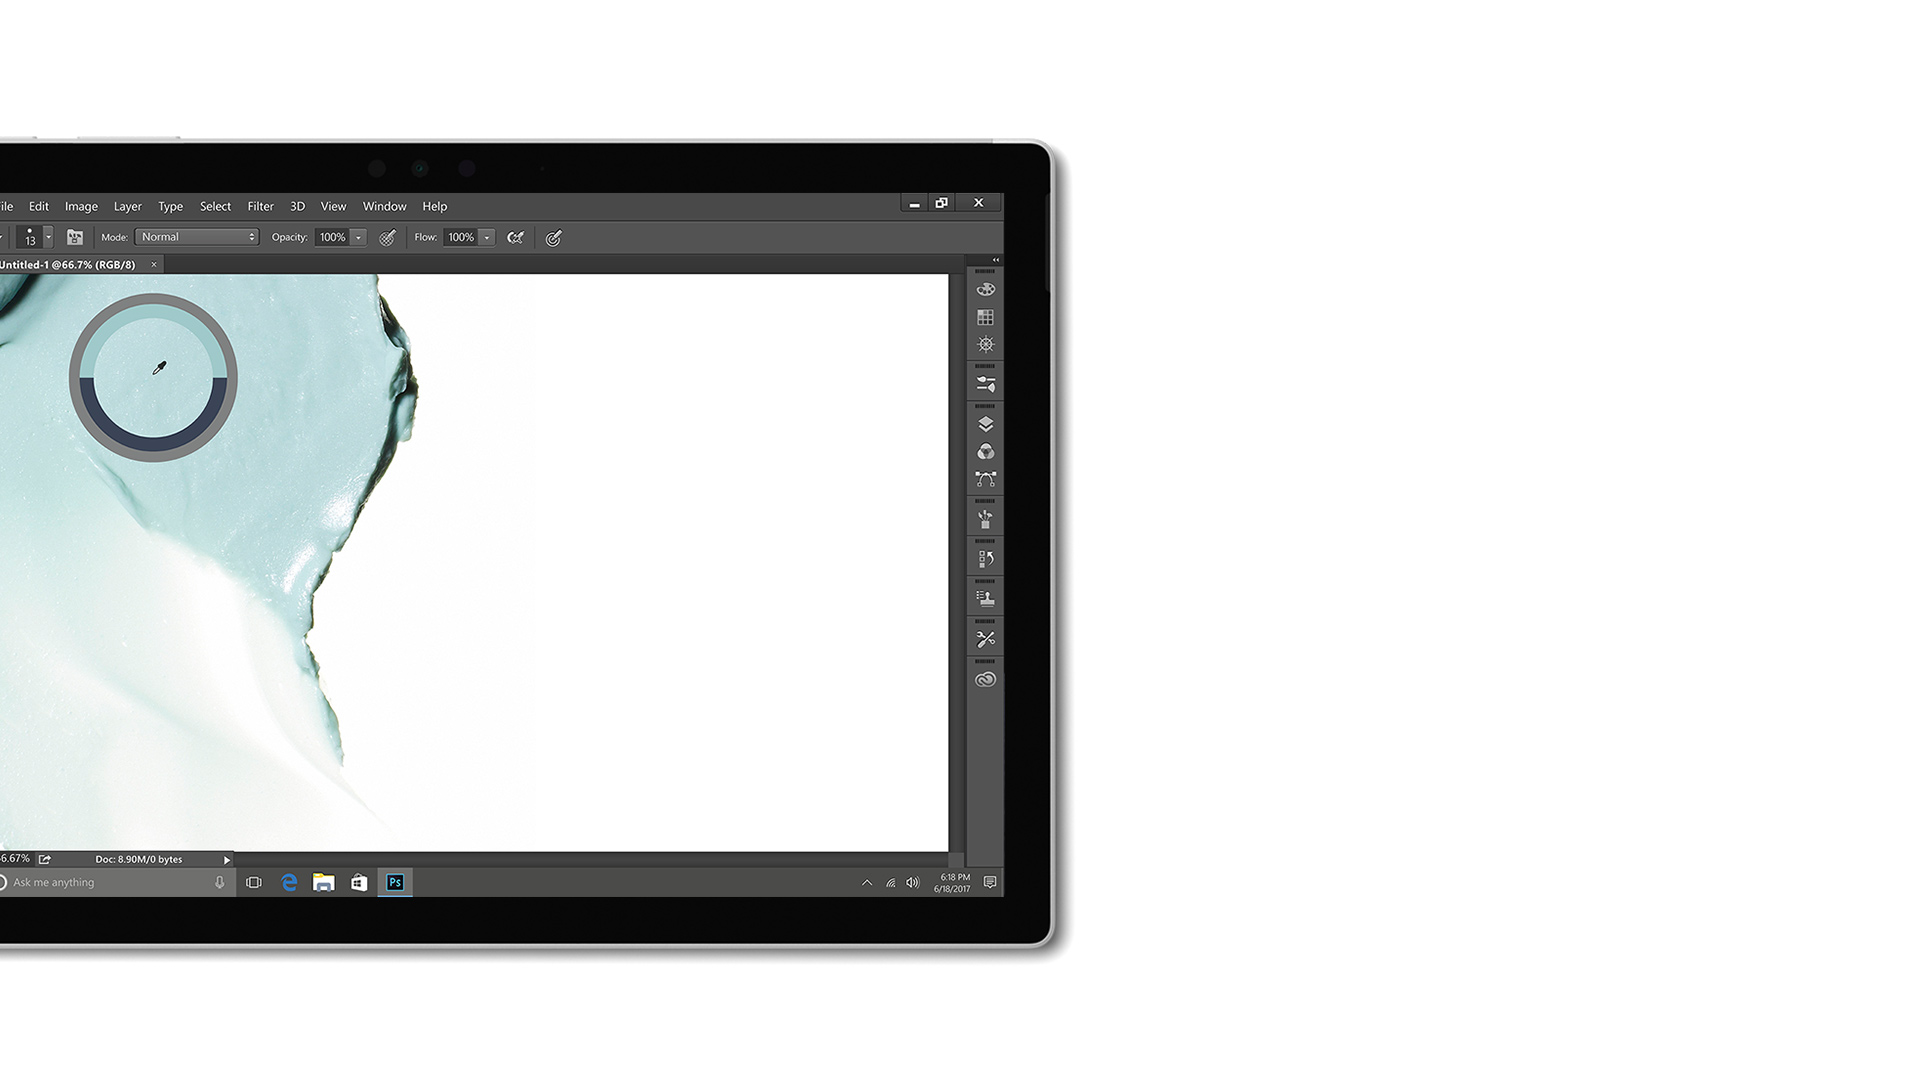 Surface 显示 Creative Cloud 应用屏幕截图。